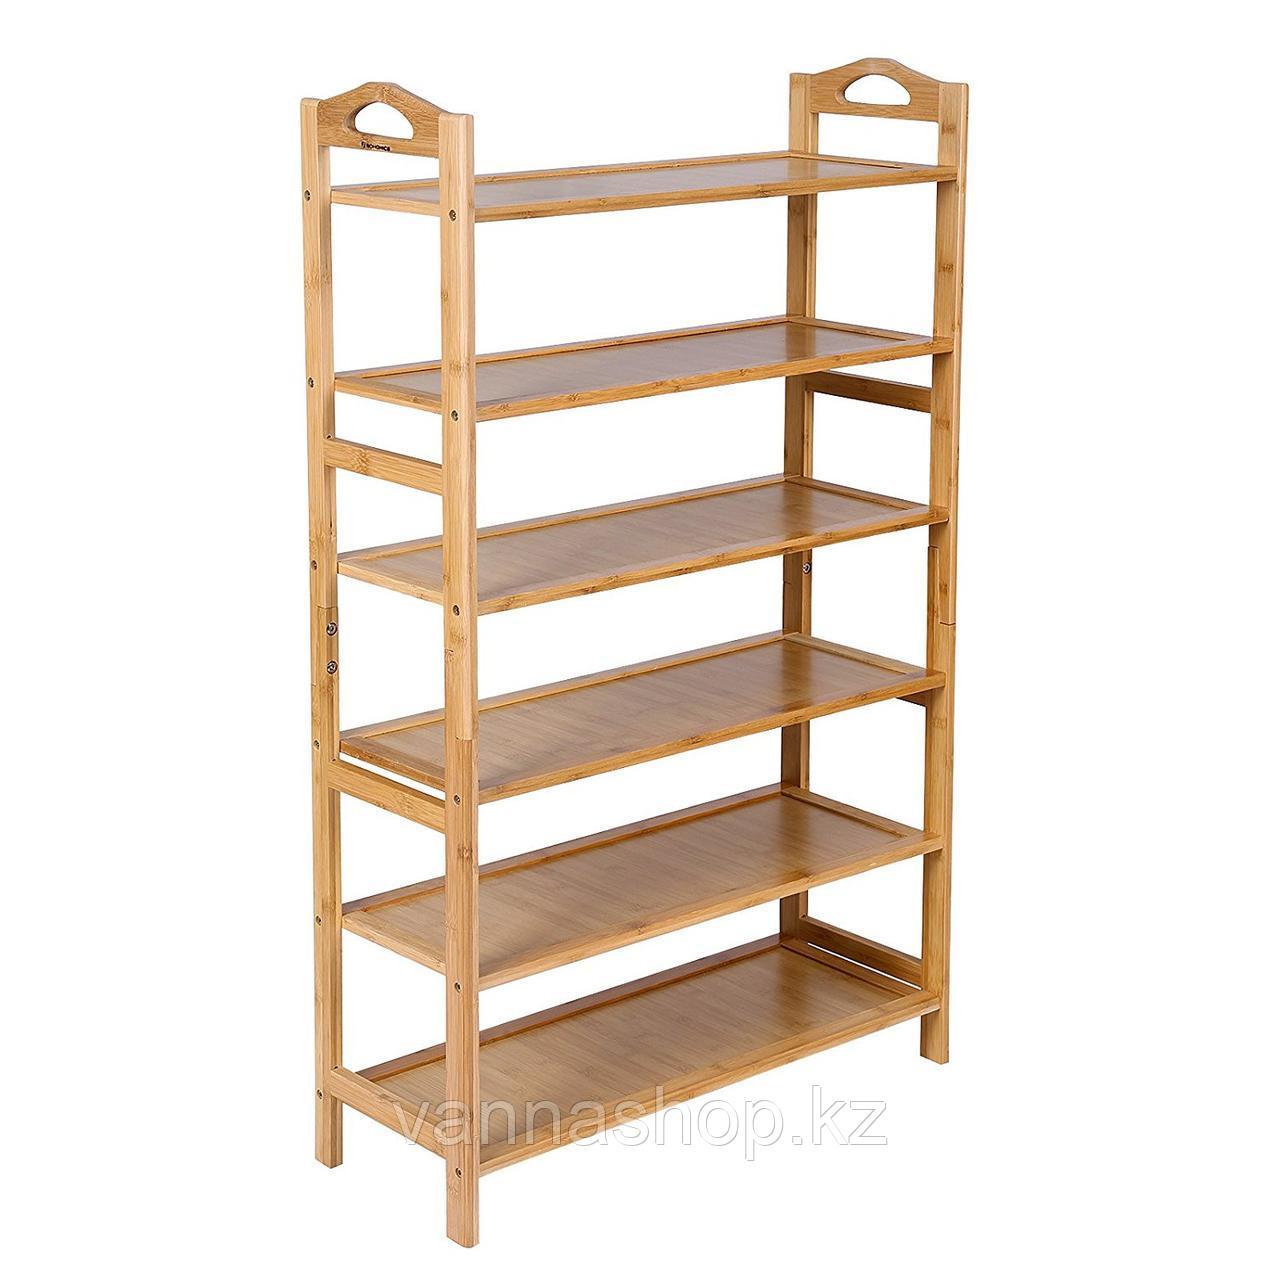 Этажерка для обуви закрытый бамбук 6 полок